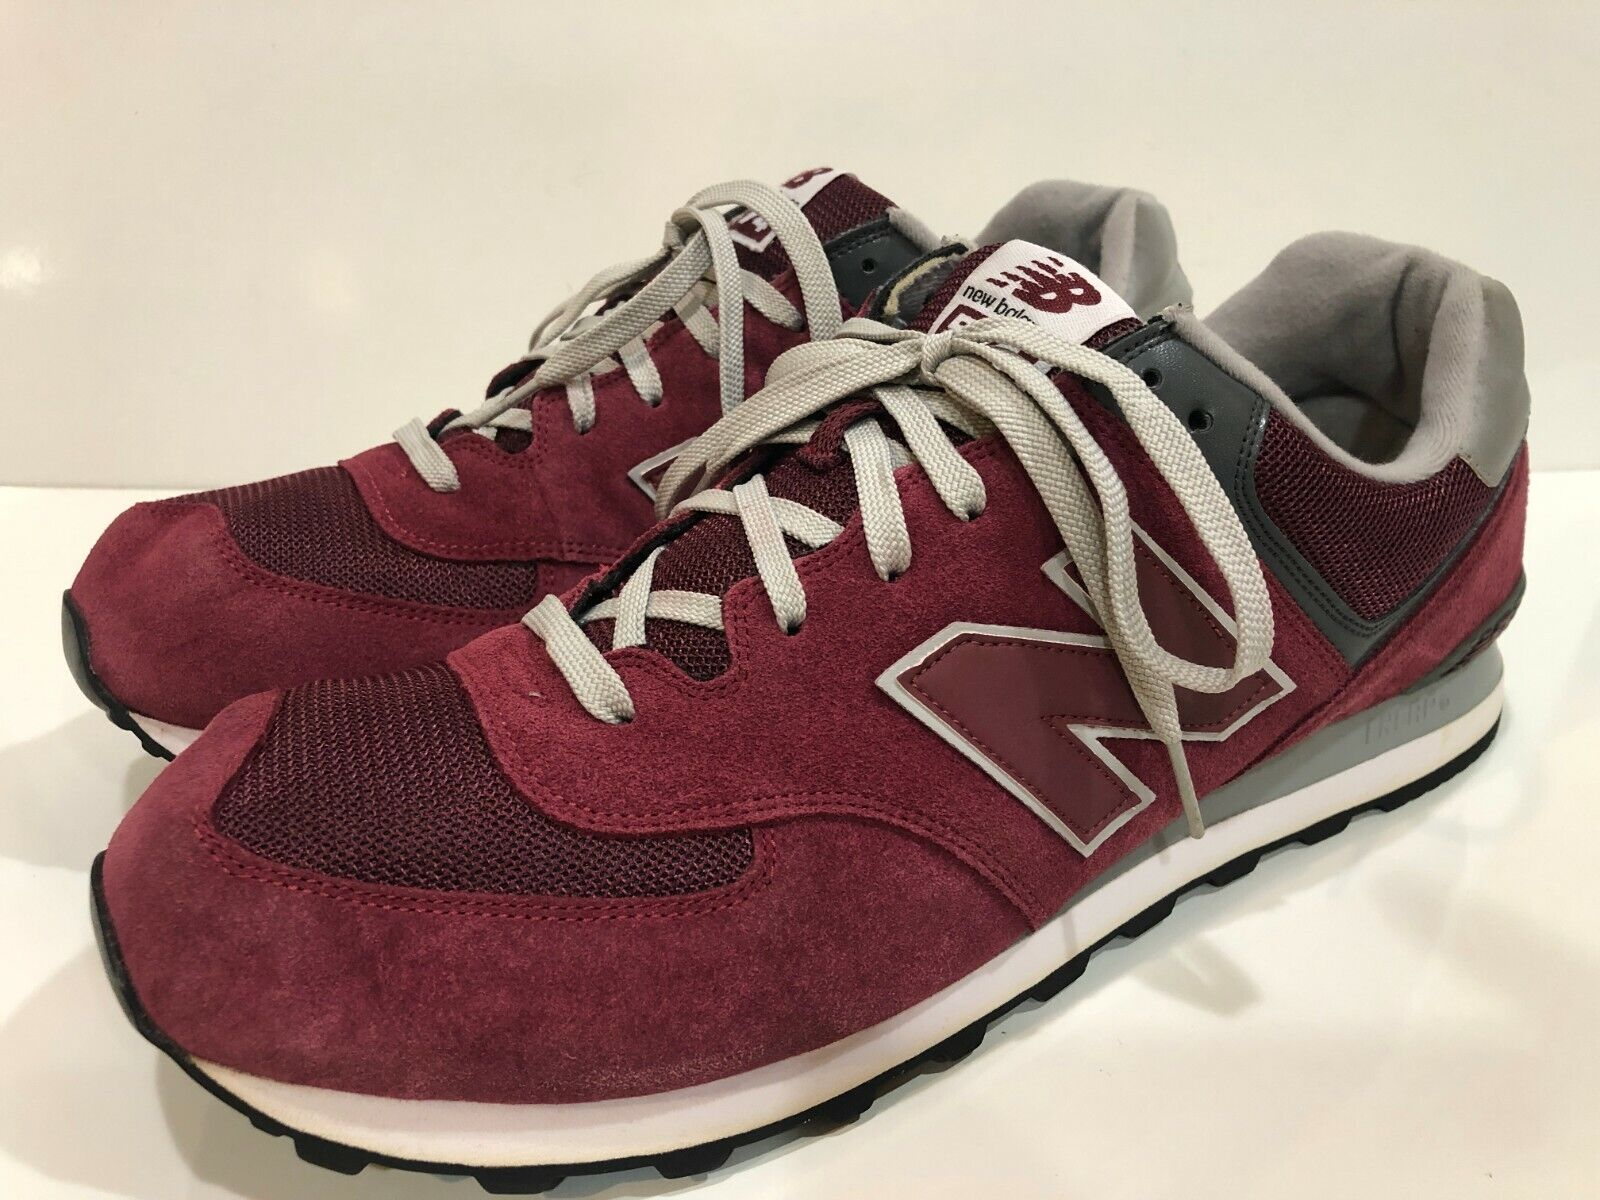 New Balance 574 Men's Athletic Walking Shoes Size 18 D